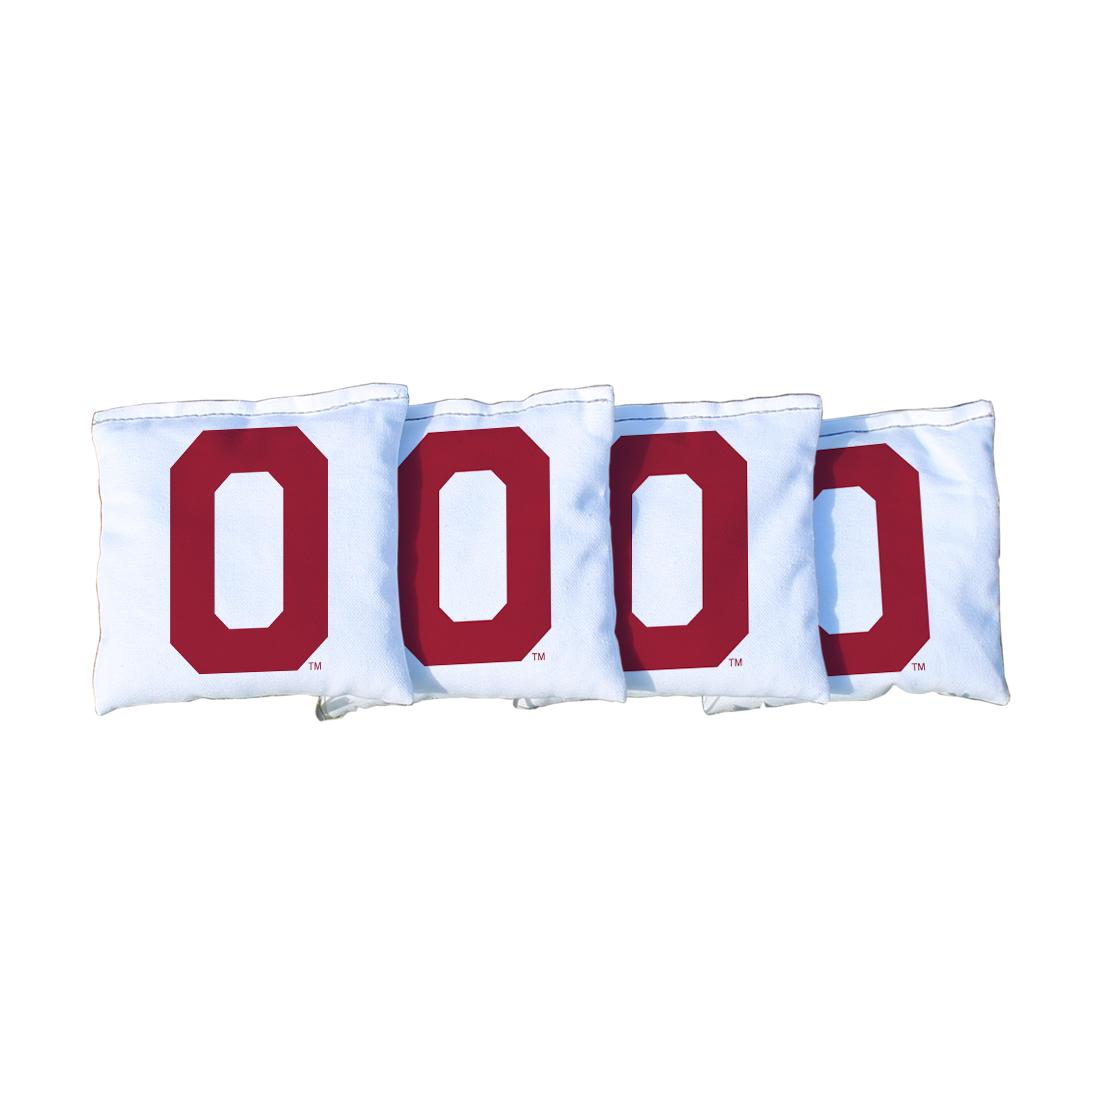 4 College Vault Oklahoma Sooners White Cornhole Bags